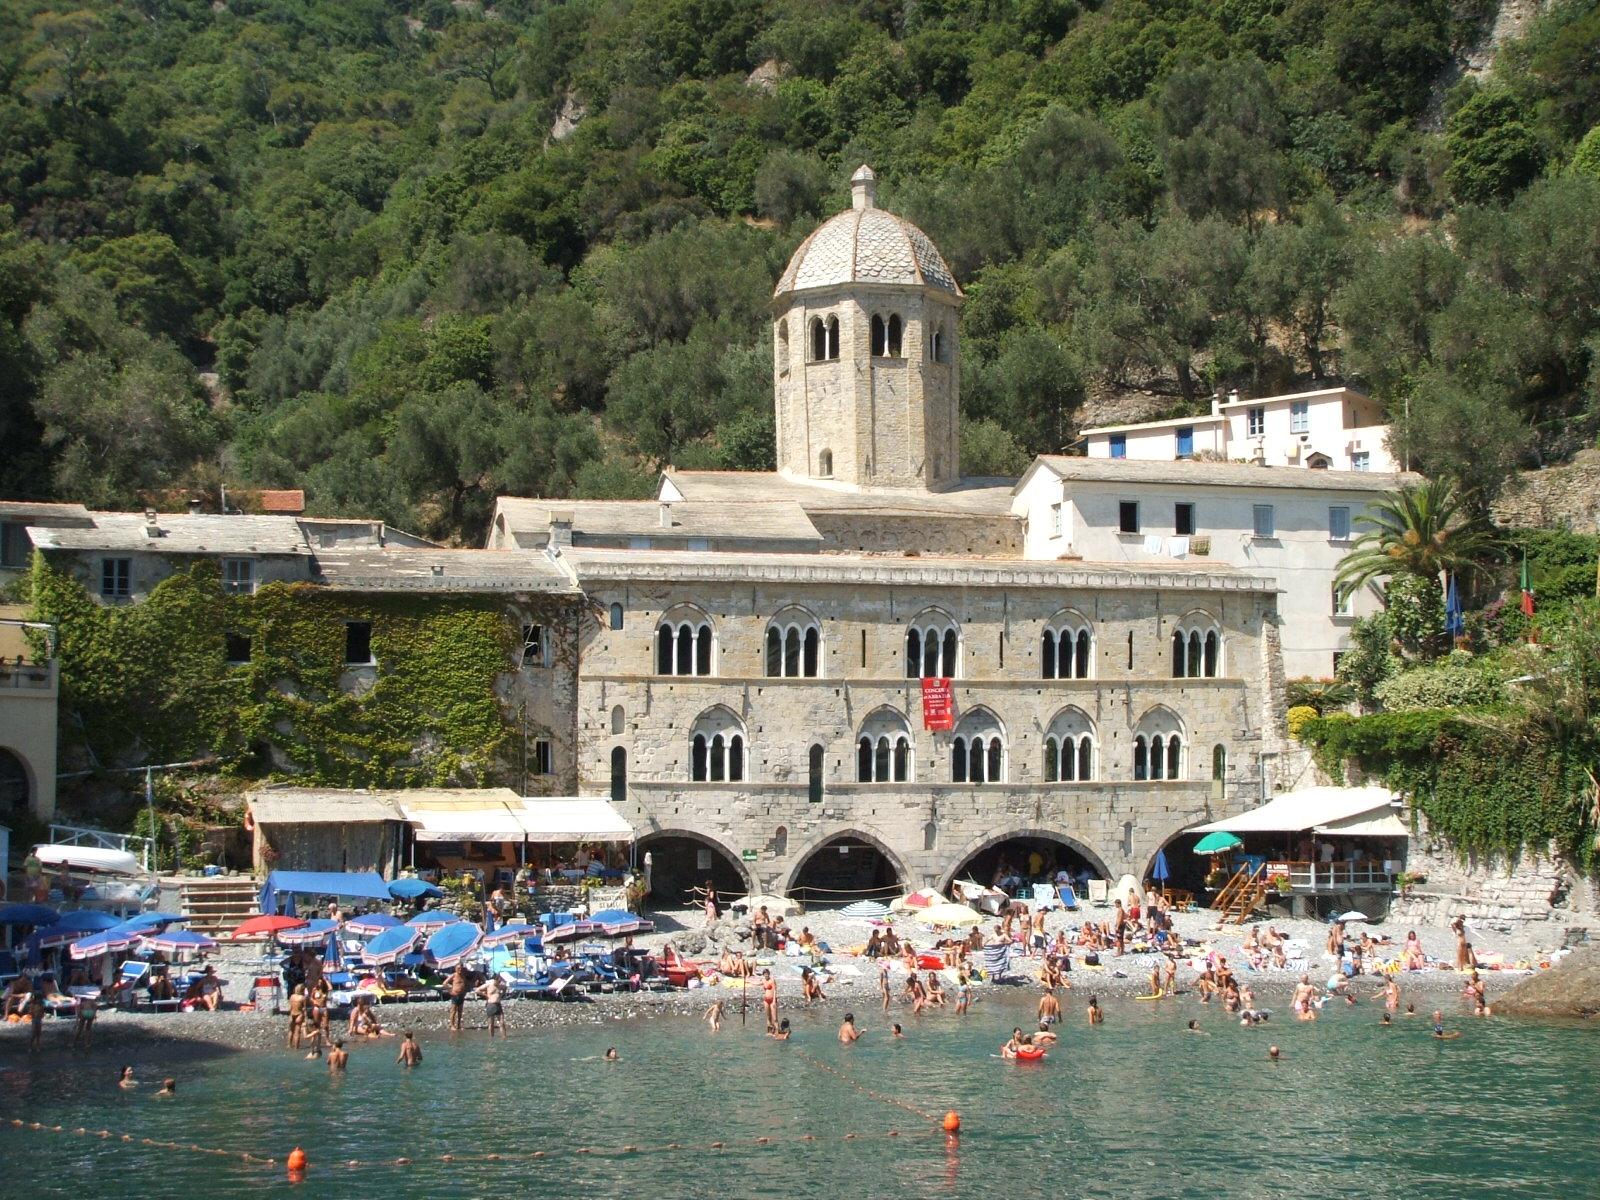 abbazia-di-san-fruttuoso-di-camogli-dscf0667_1396641376